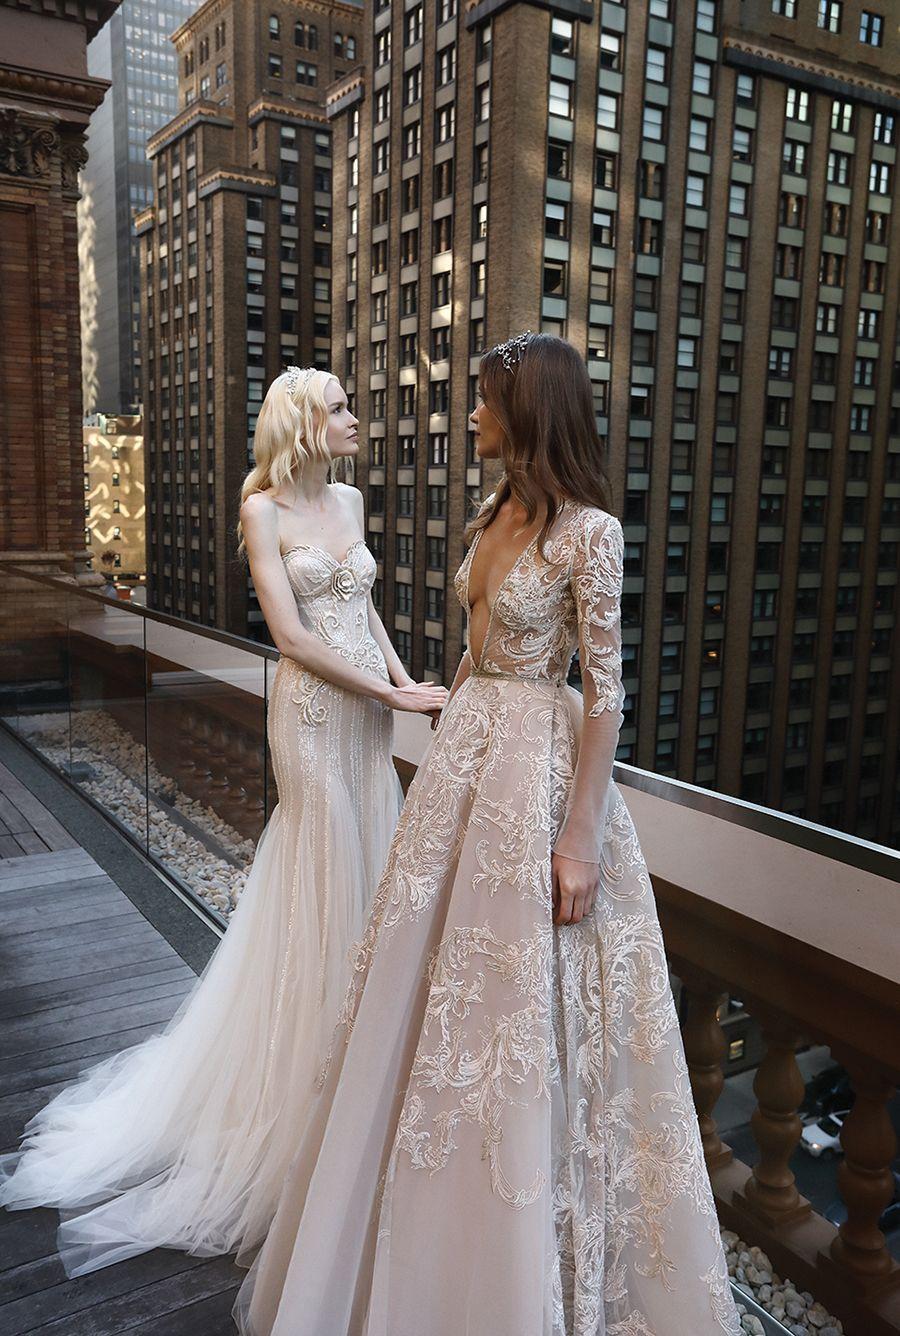 Inbal drorus fall wedding dress collection pink wedding gowns